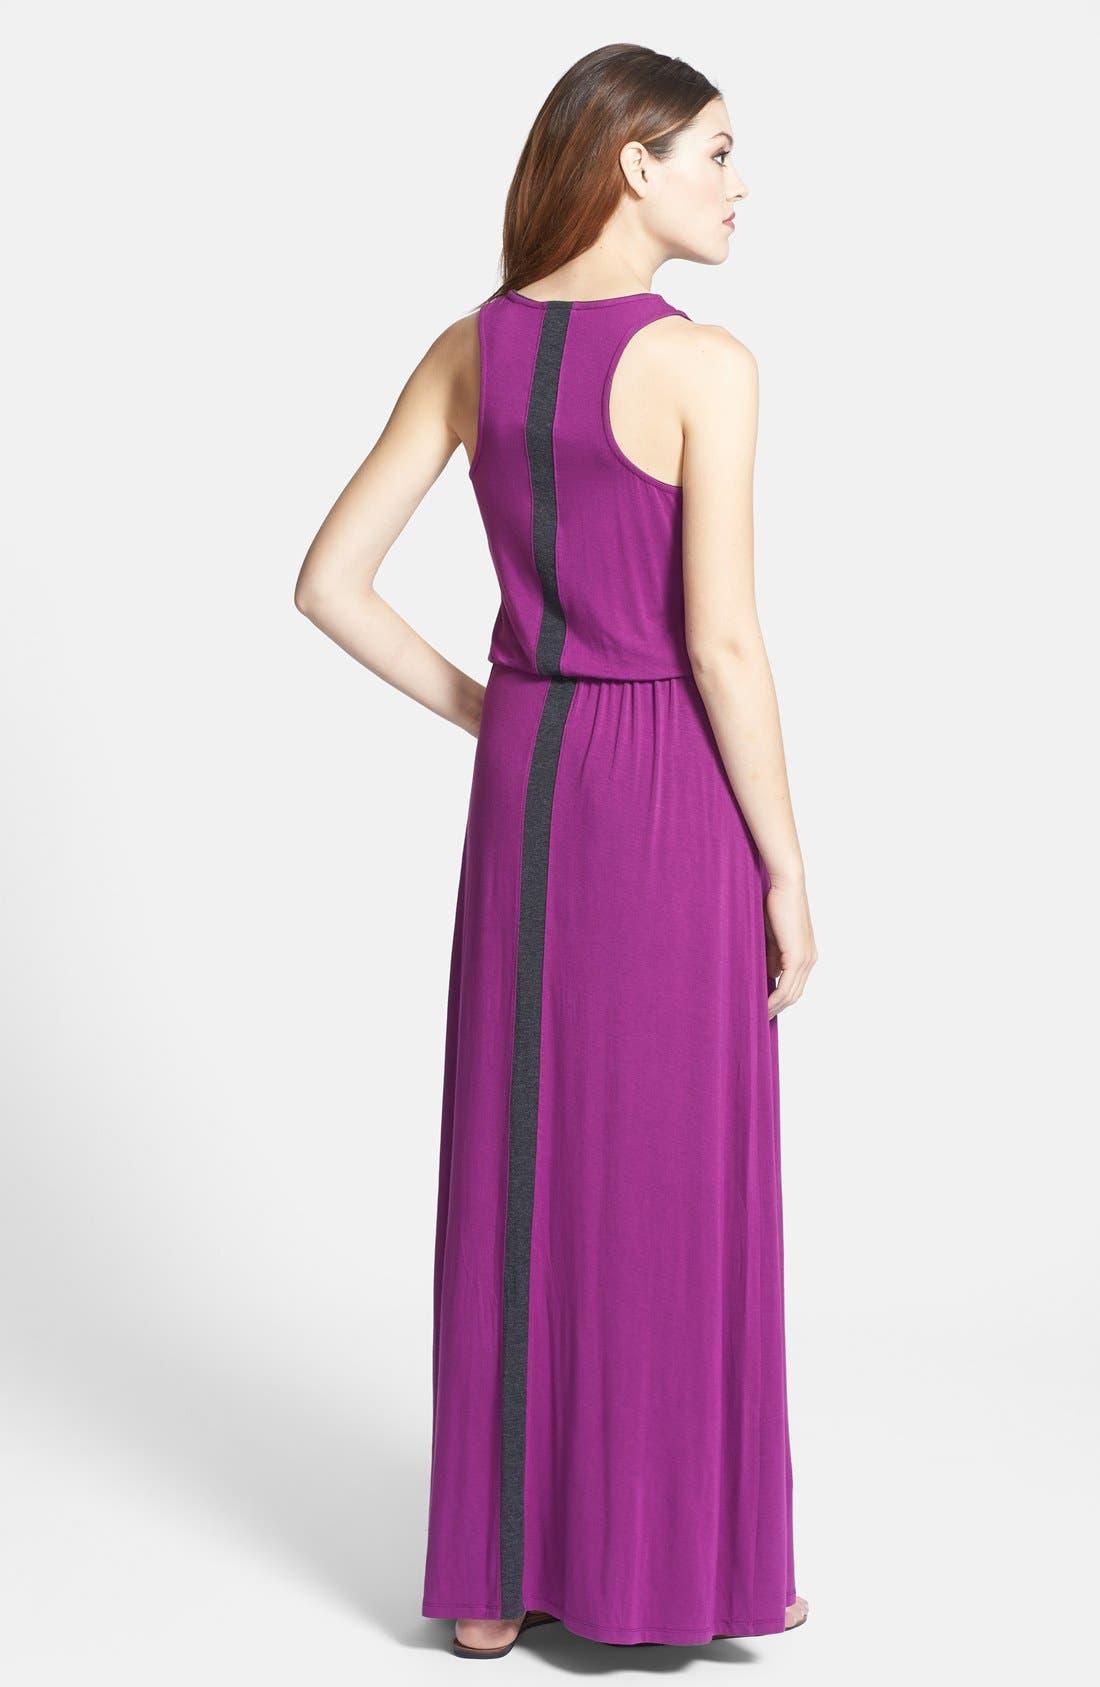 Contrast Stripe Racerback Maxi Dress,                             Alternate thumbnail 2, color,                             Purple Phlox/ Heather Charcoal